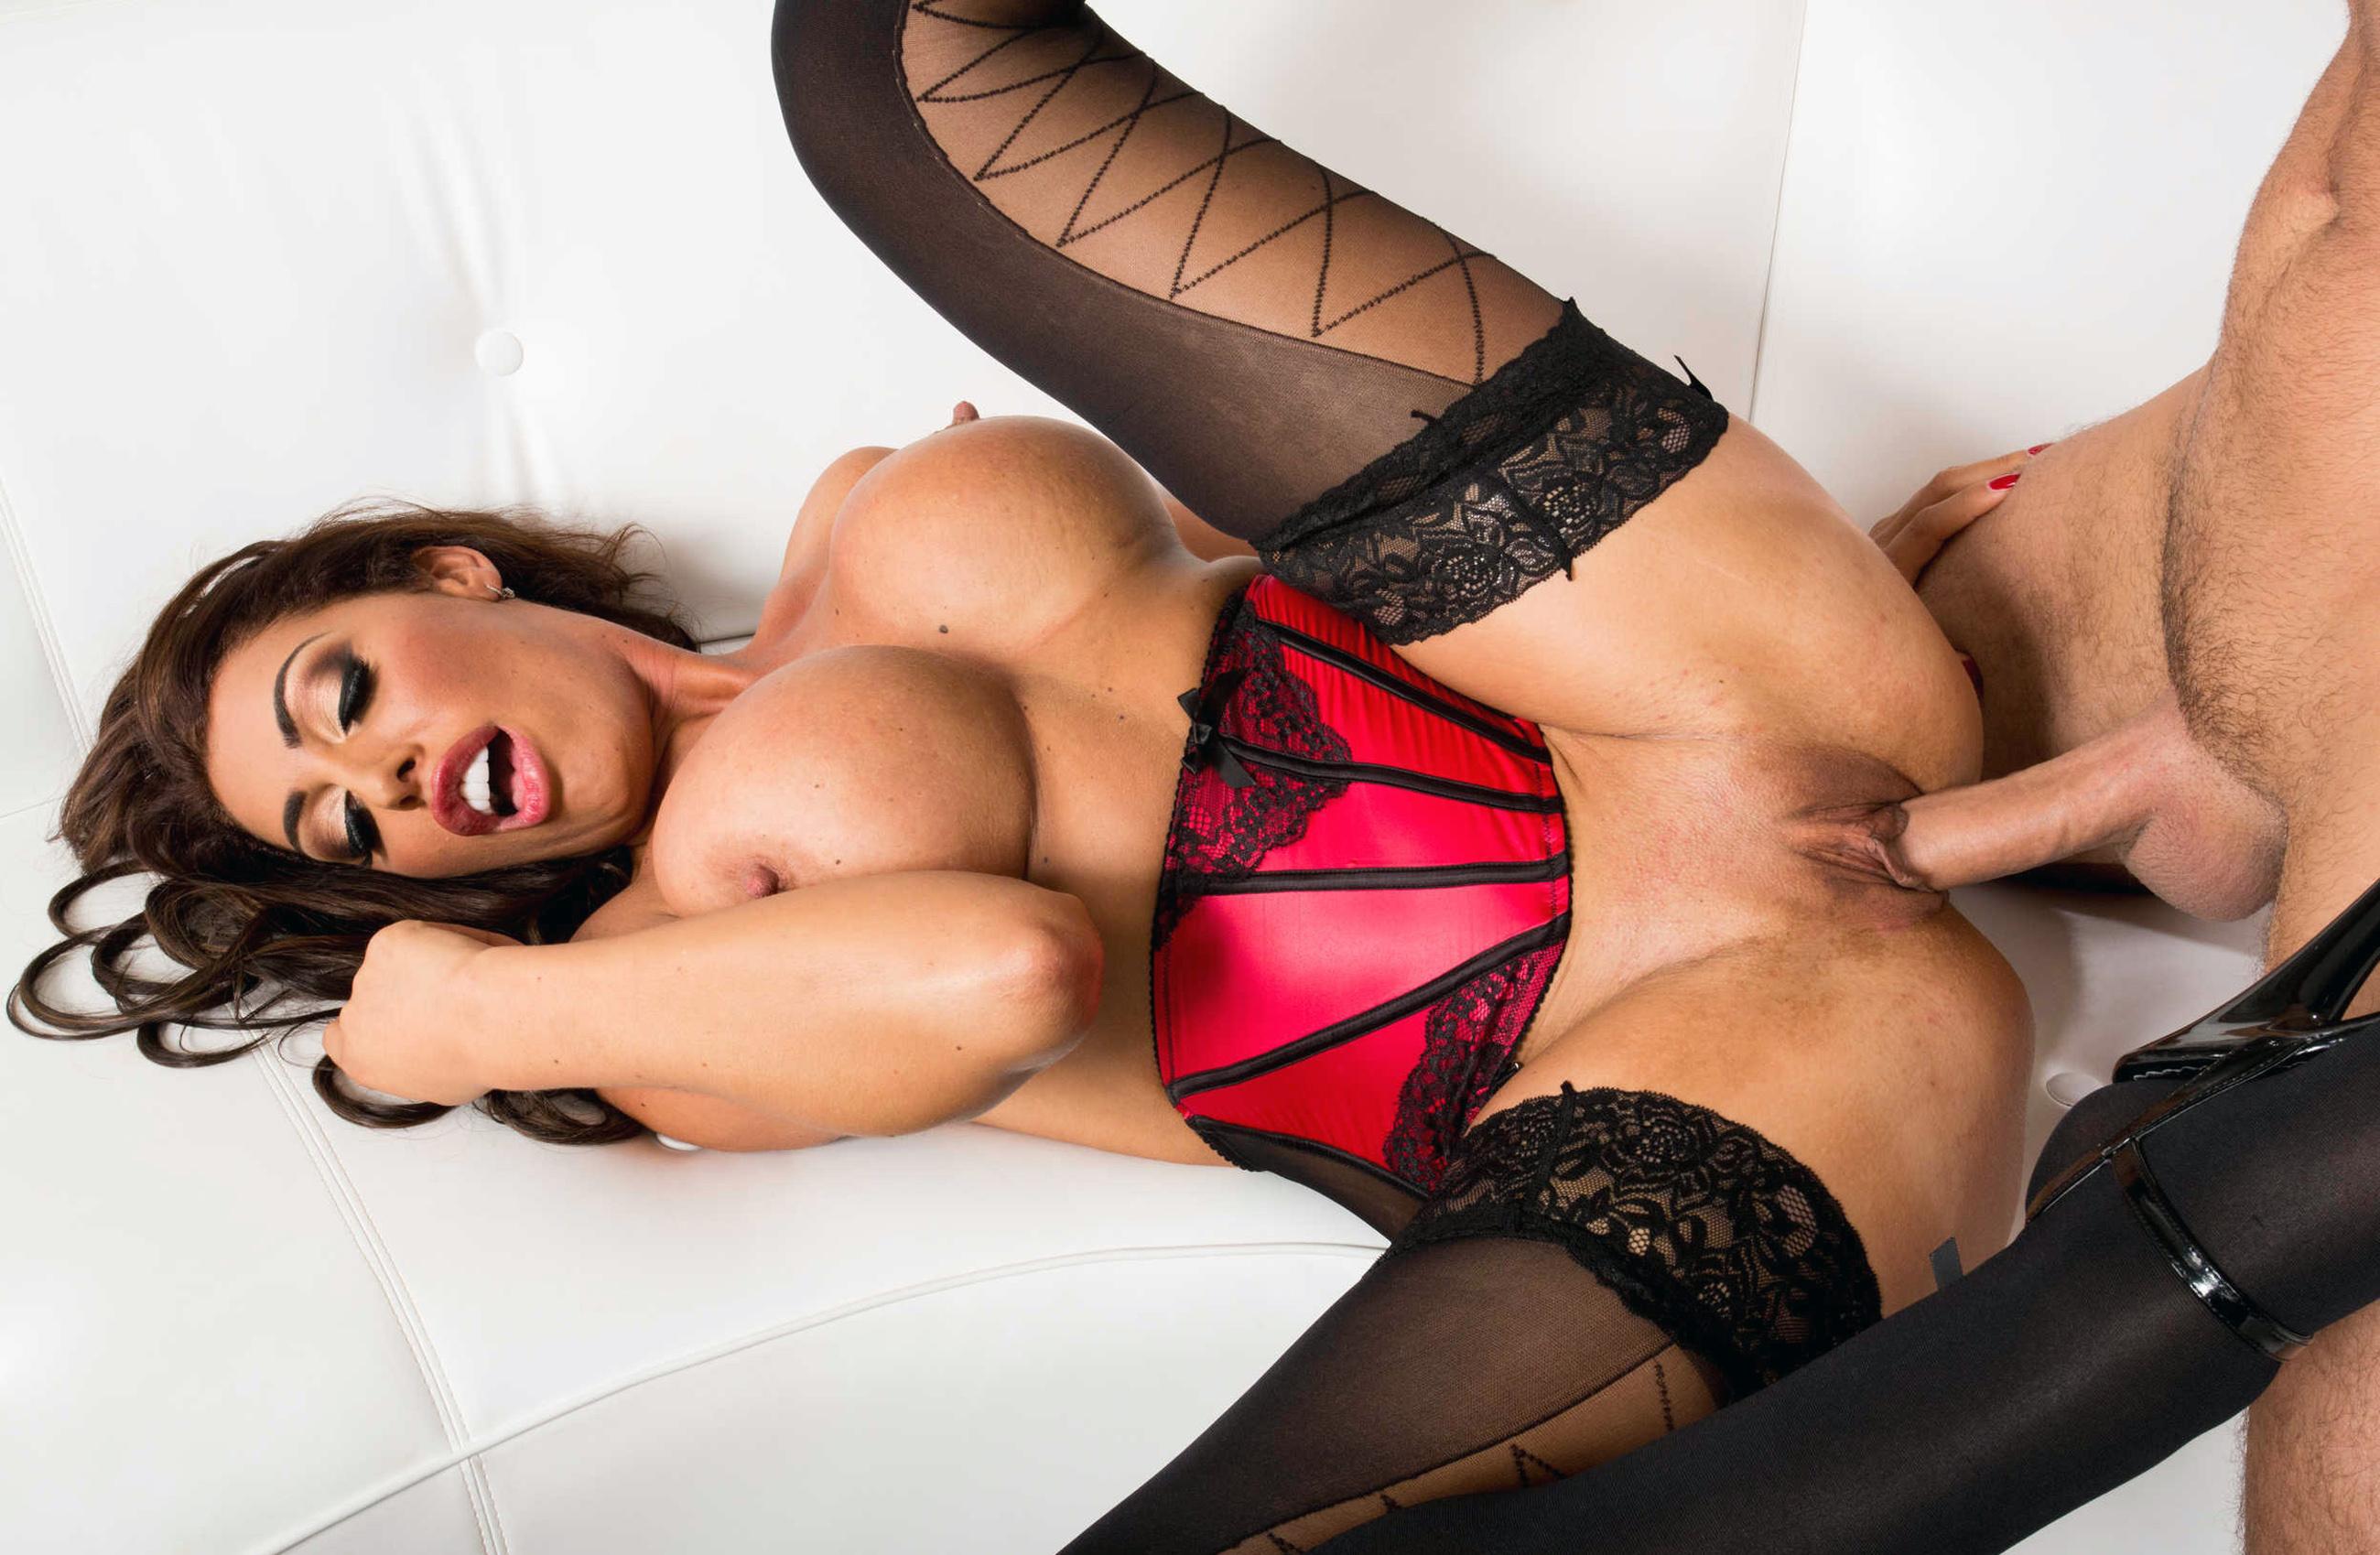 Hardcore porn xxx tits boobs pussy